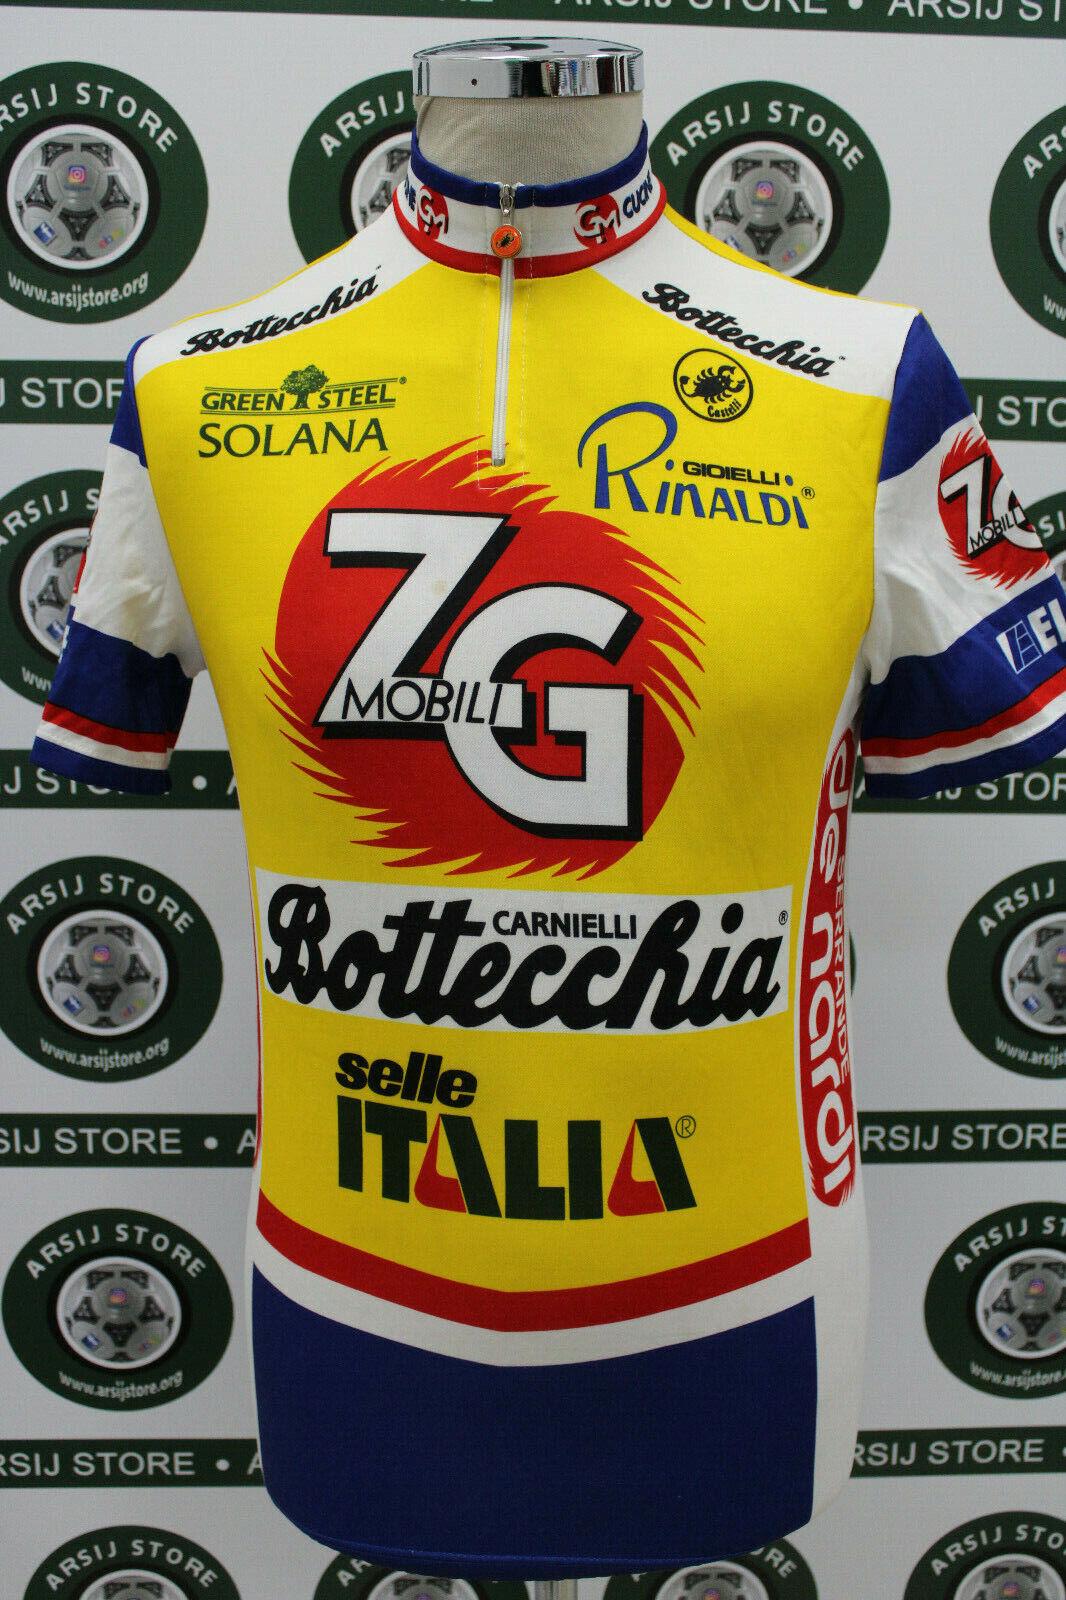 Maglia ciclismo ZG MOBILI TG IV IV IV M438 bike shirt maillot trikot camiseta f5a